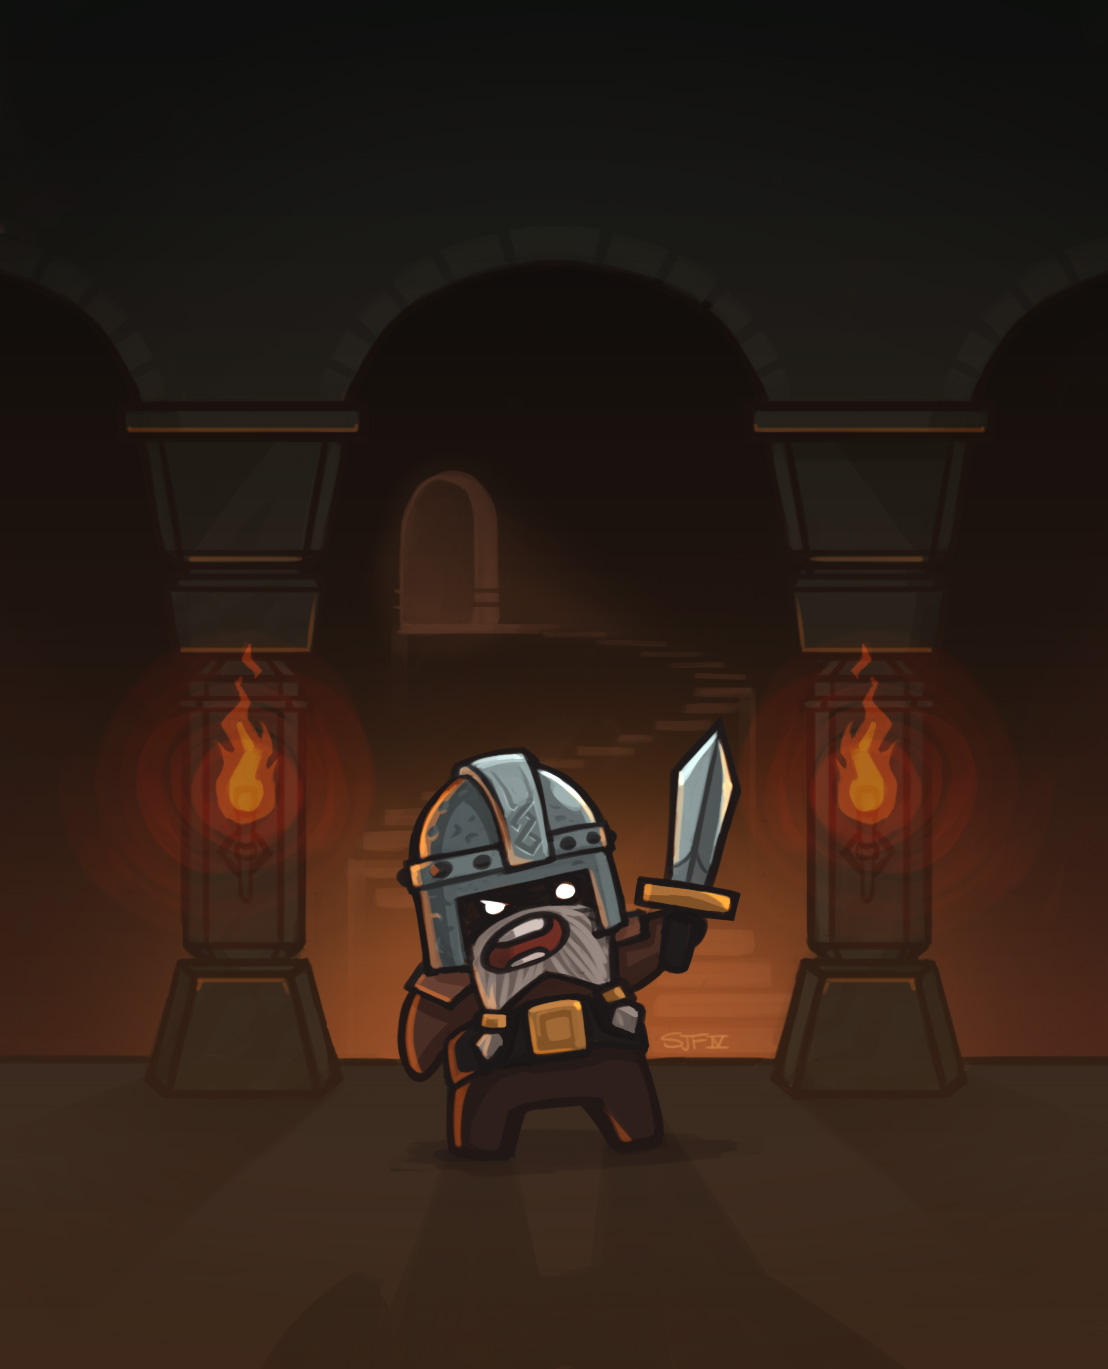 A Dwarfy Dwarf Defending his Dwarfy Hoard by cairn4